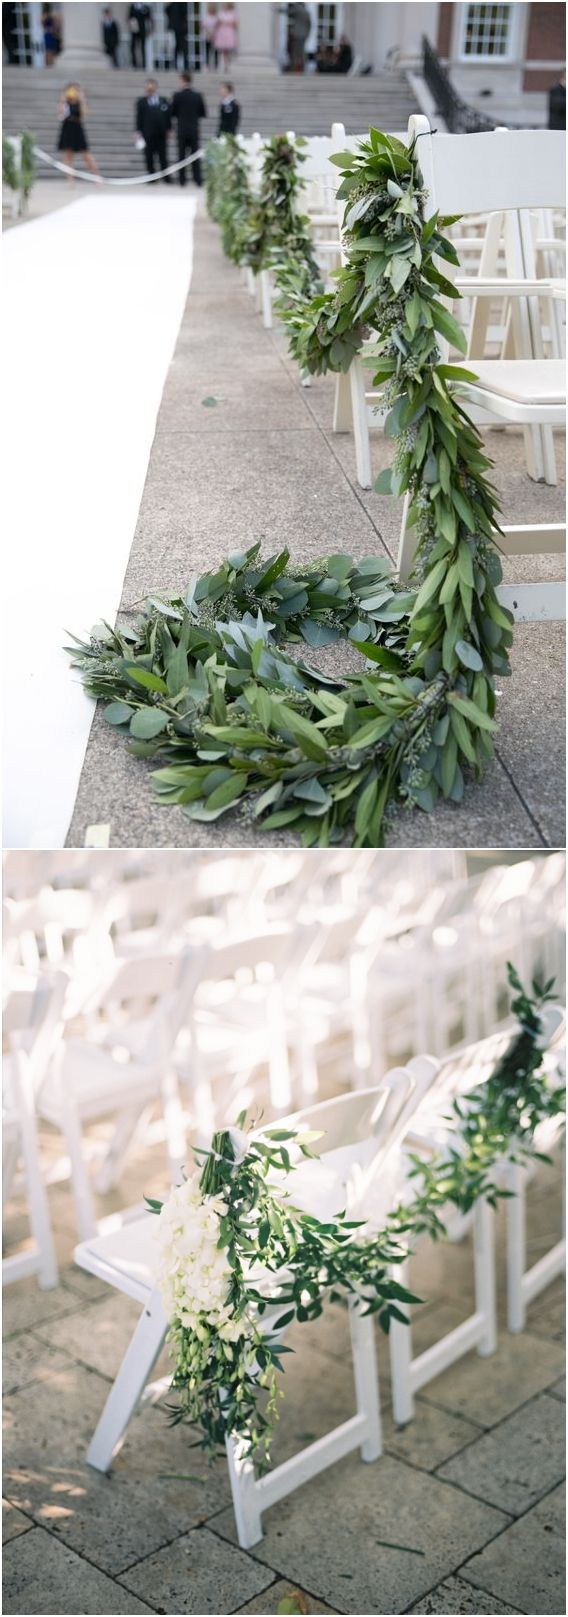 Decor ideas for wedding   Greenery Eucalyptus Wedding Decor Ideas  Green Weddings